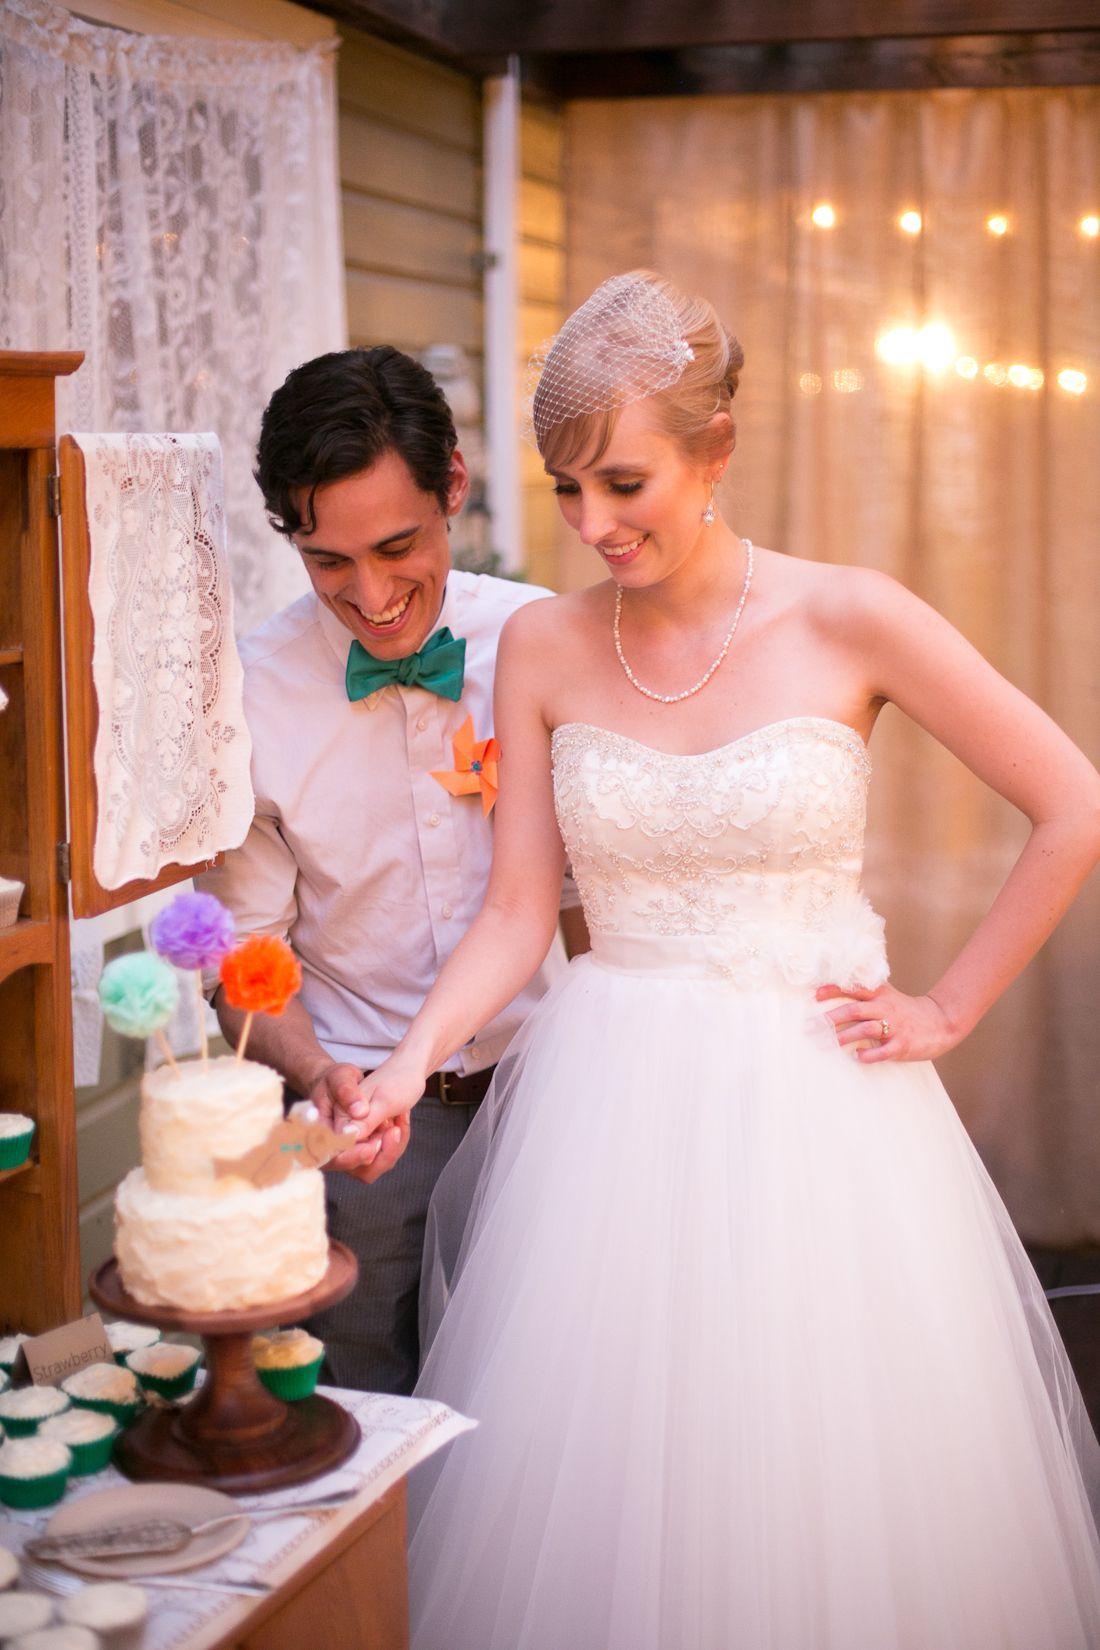 Diy Backyard Bbq Wedding Reception Backyard Bbq Wedding Backyard Bbq Wedding Reception Bbq Wedding